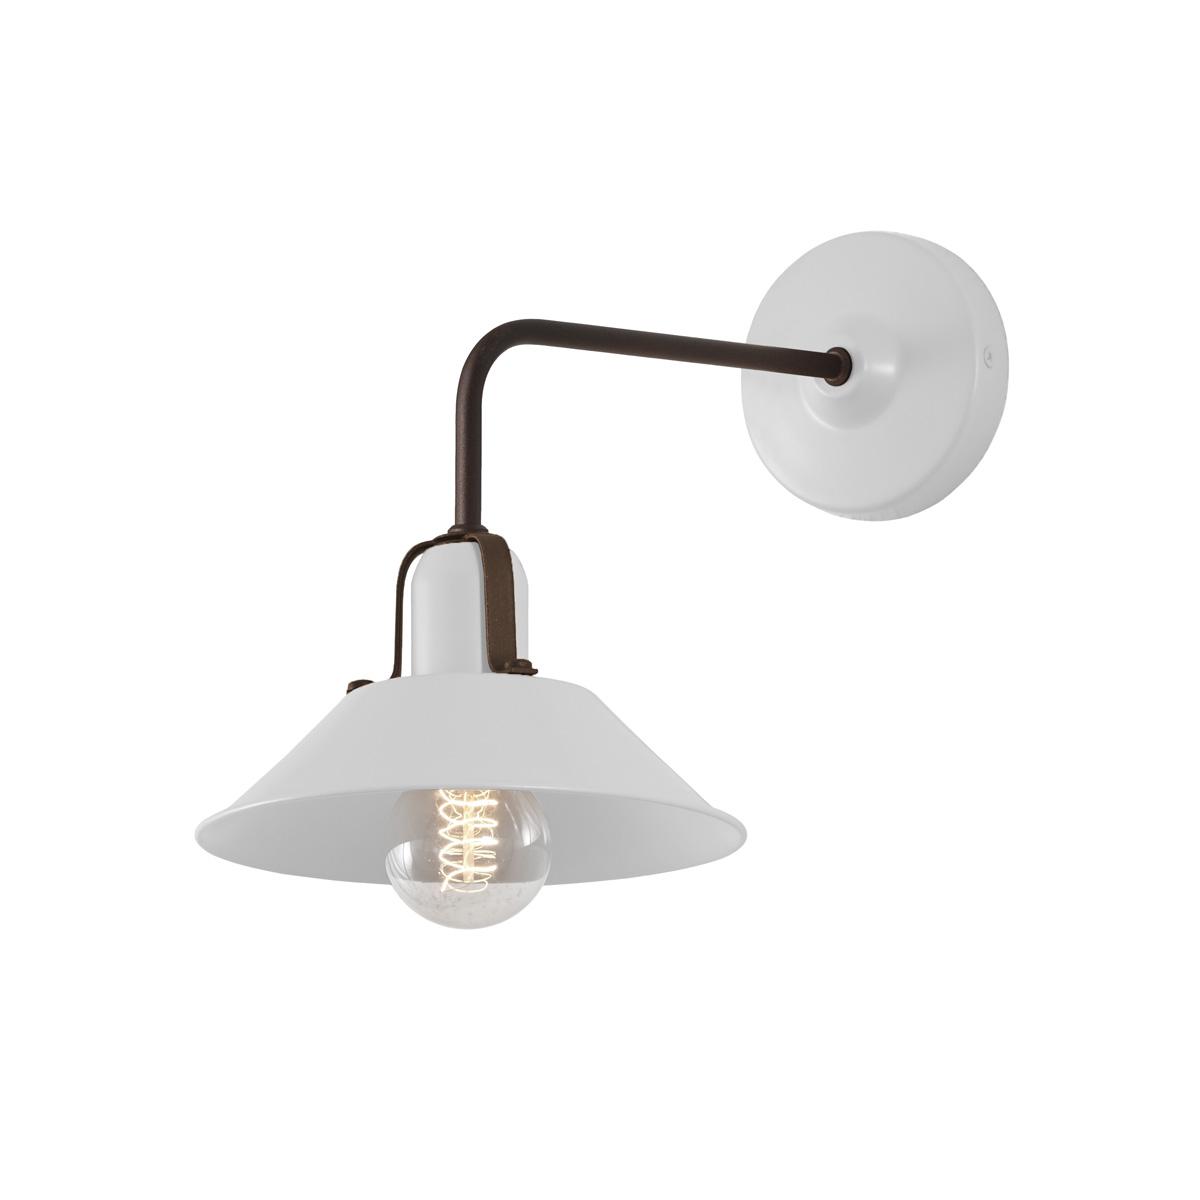 Vintage λευκή απλίκα ΜΗΛΟΣ vintage white wall lamp